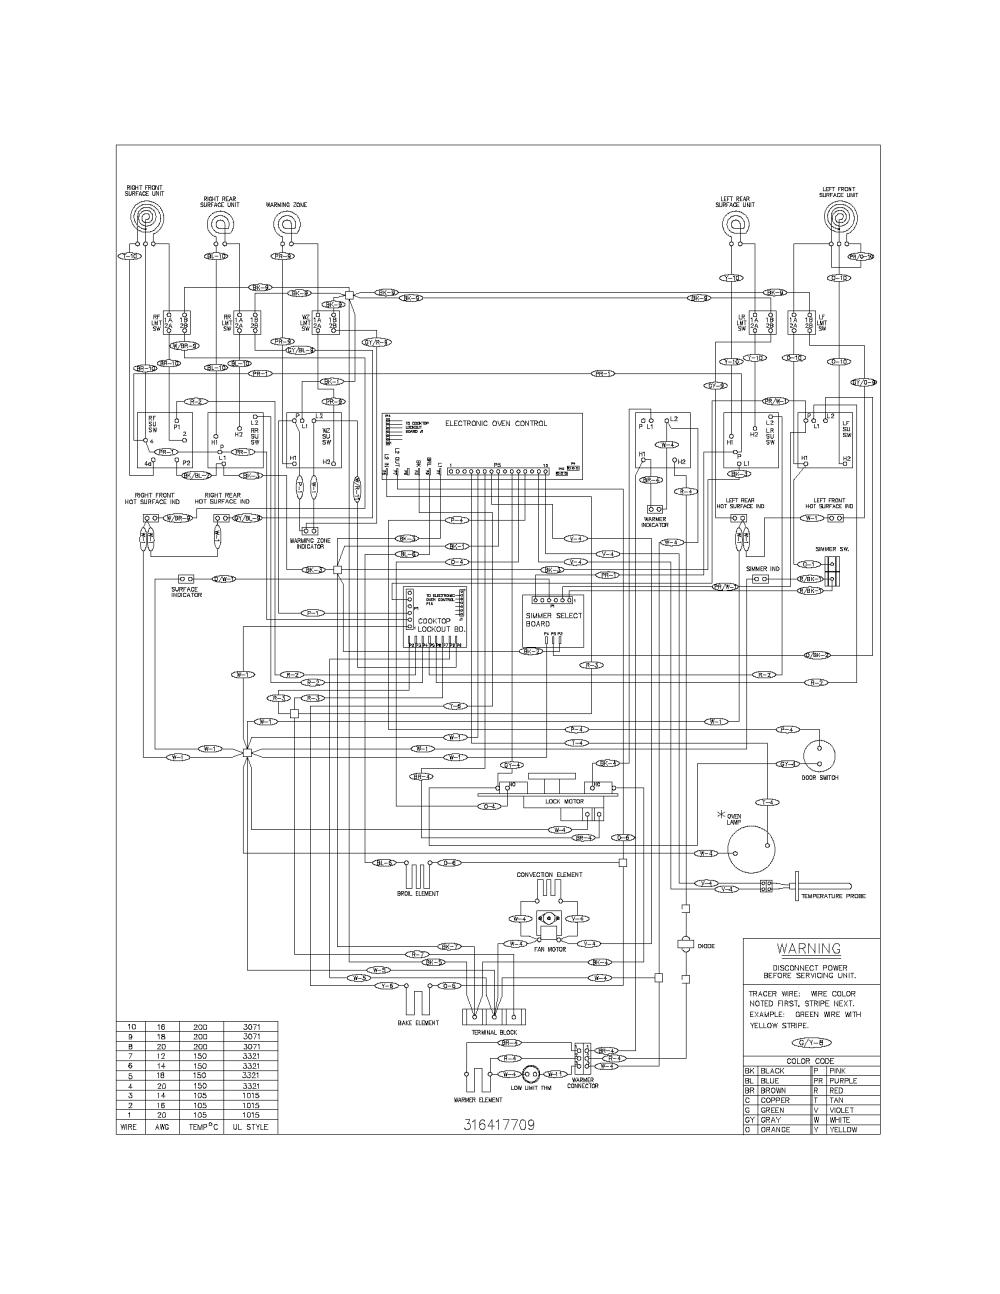 medium resolution of old range wiring diagram wiring diagramkenmore range wiring diagram wiring diagrams export old